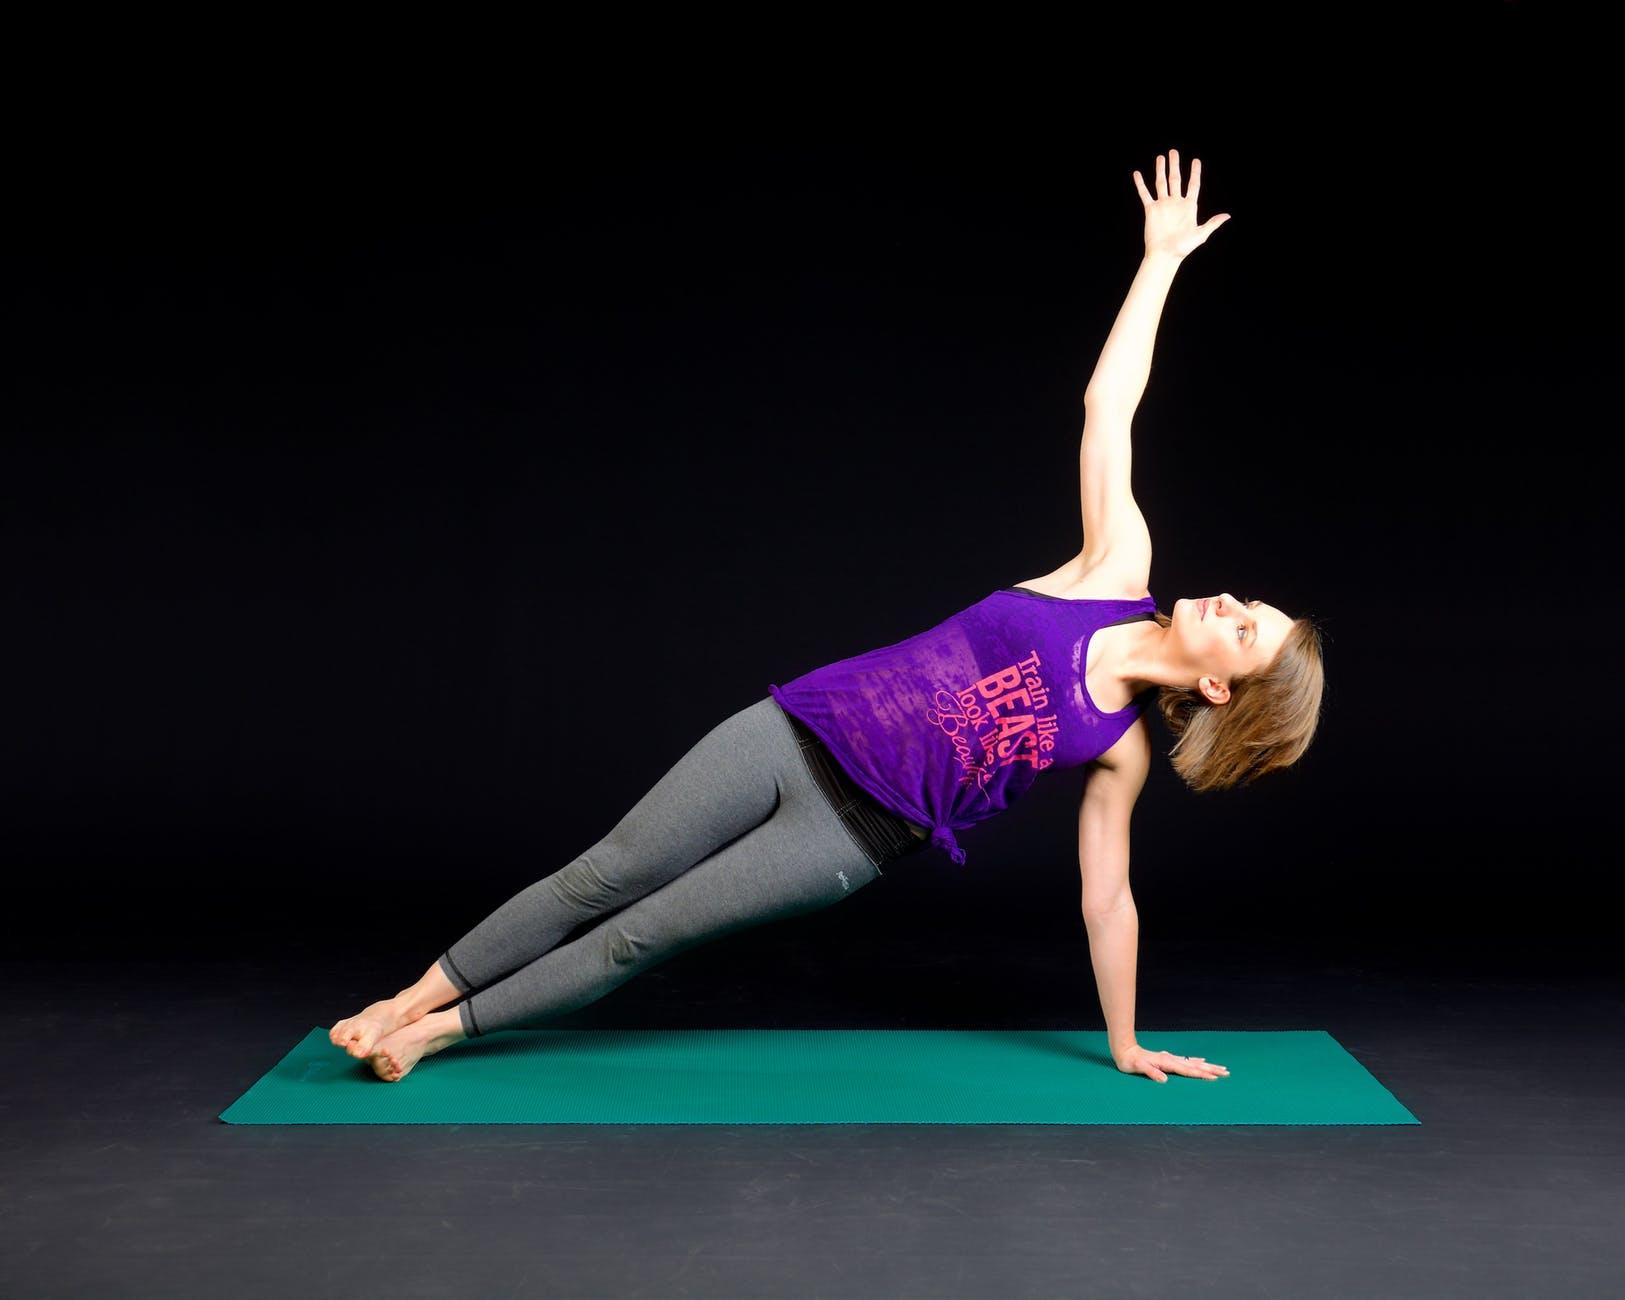 plank-fitness-muscular-exercising-163437.jpeg